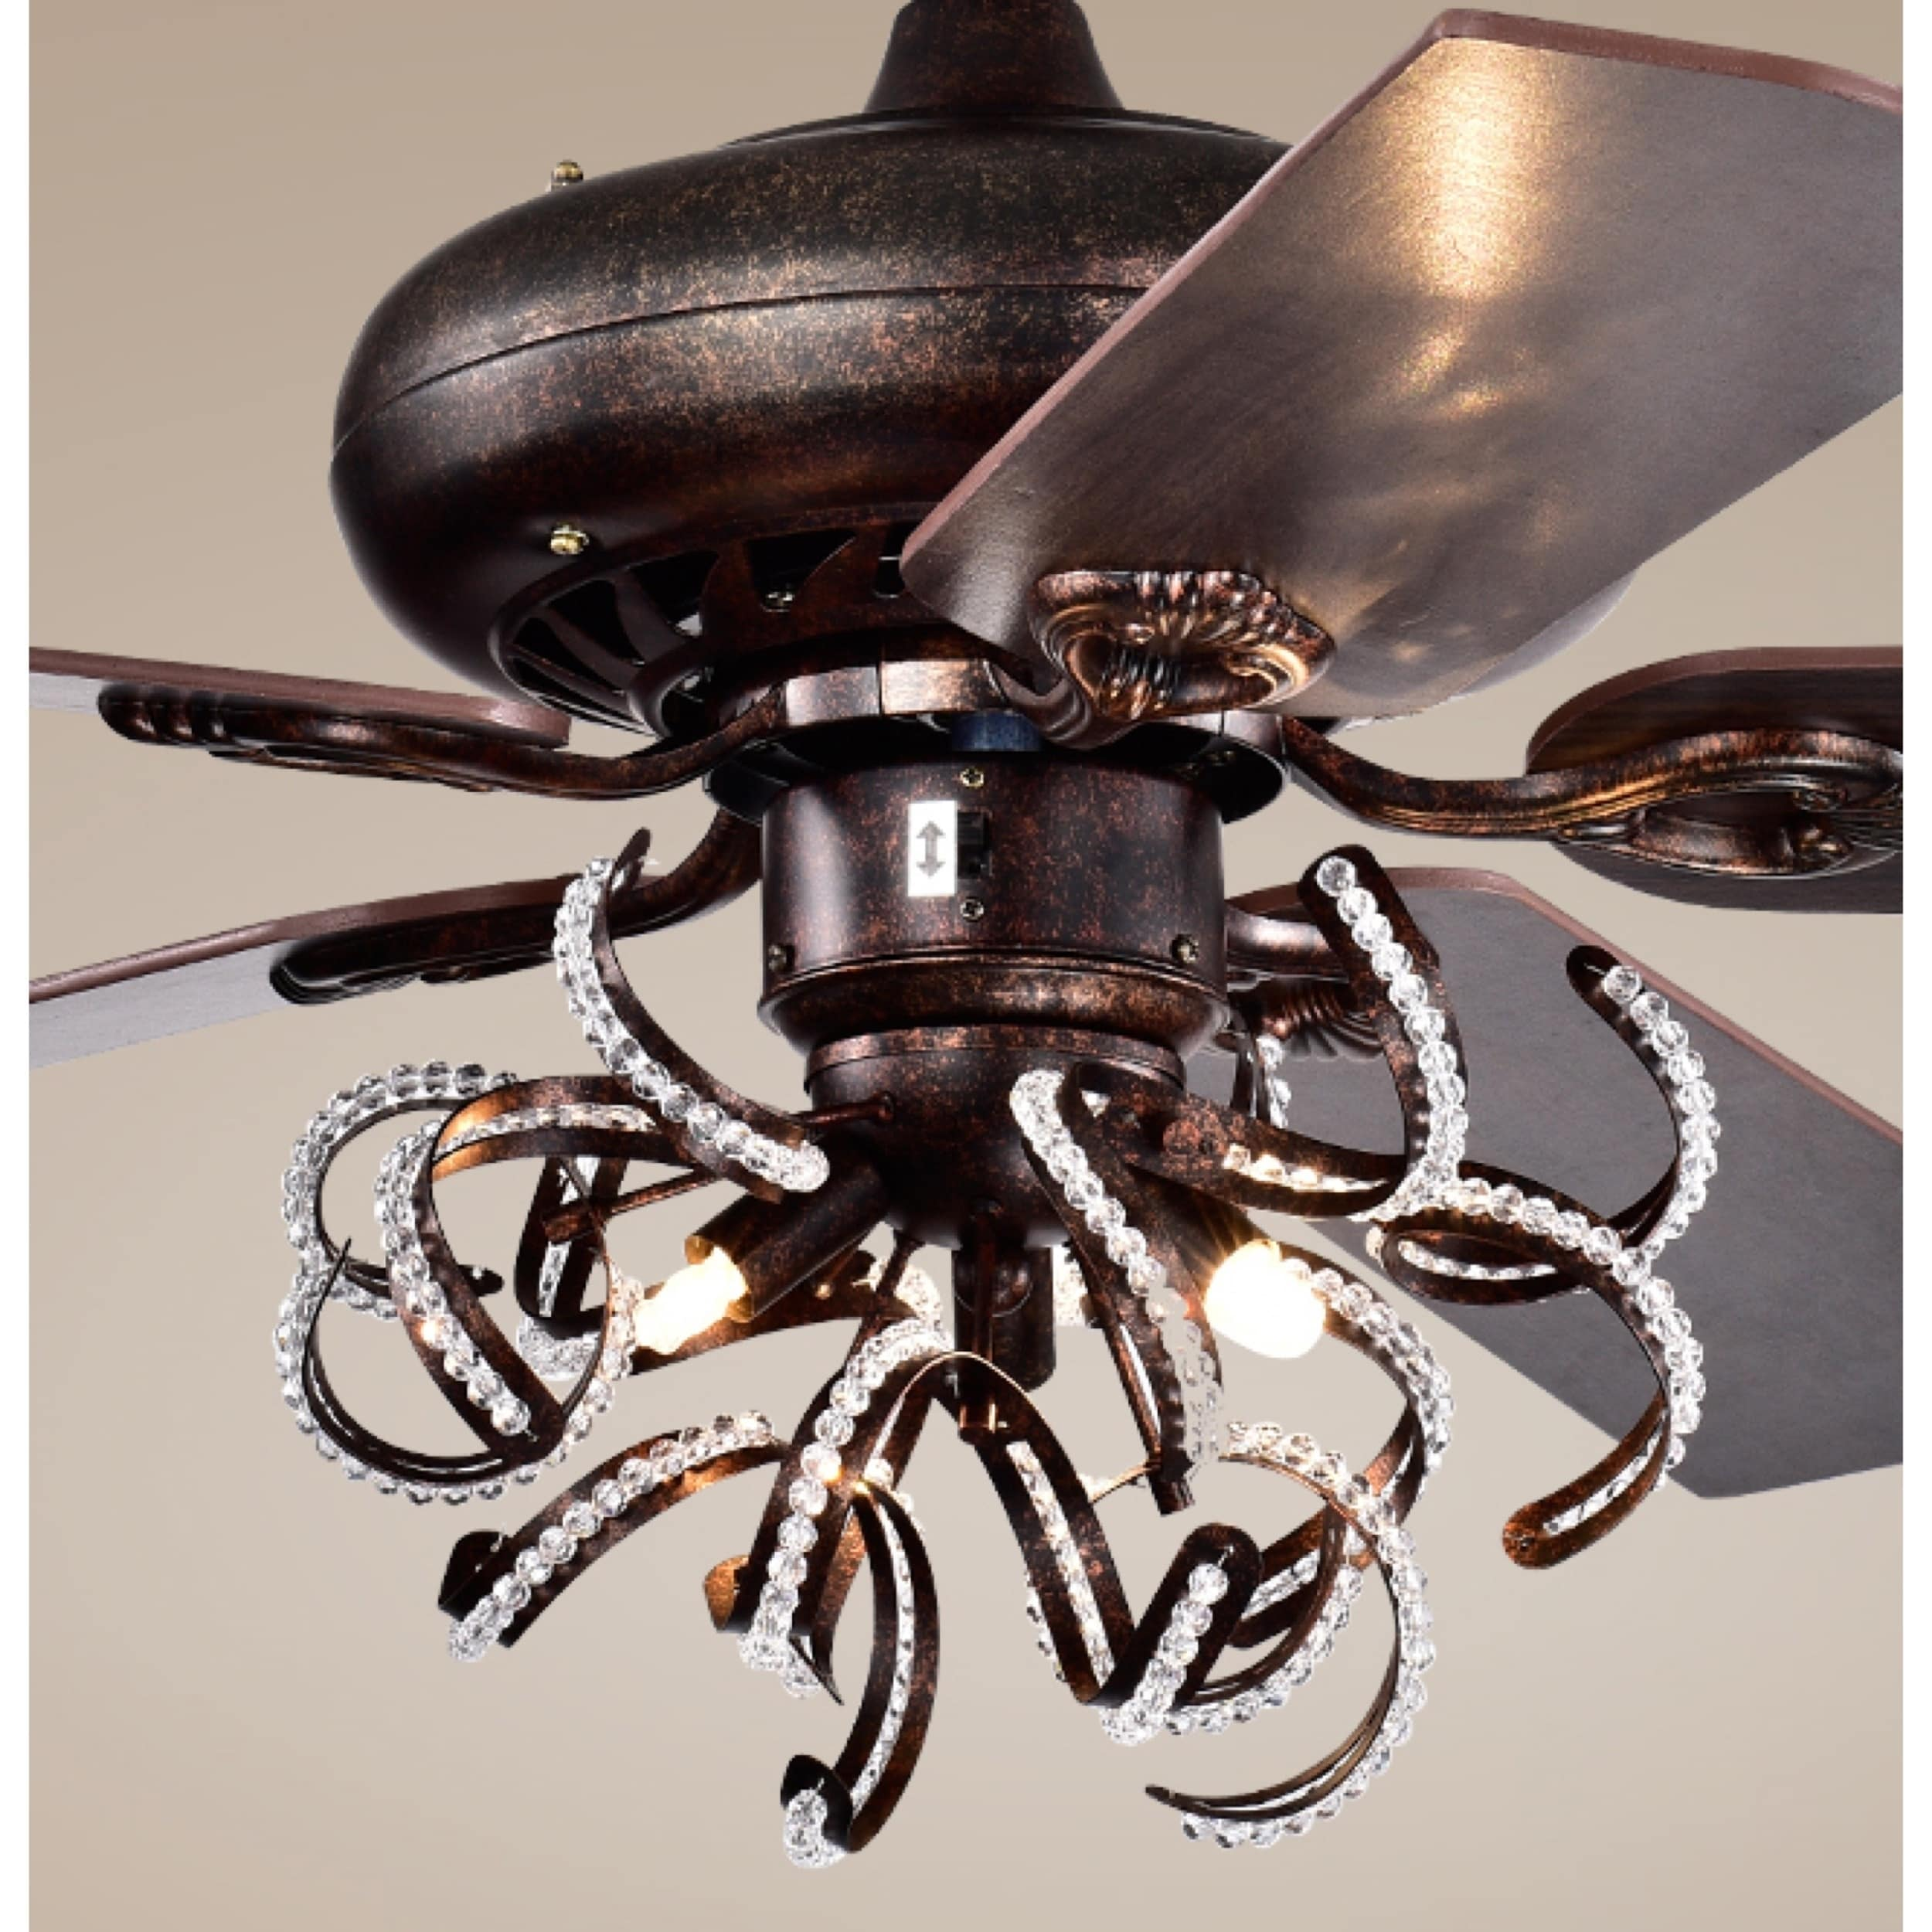 Safavieh Lighting 52-Inch Sensa Ceiling Light Fan (with Remote)